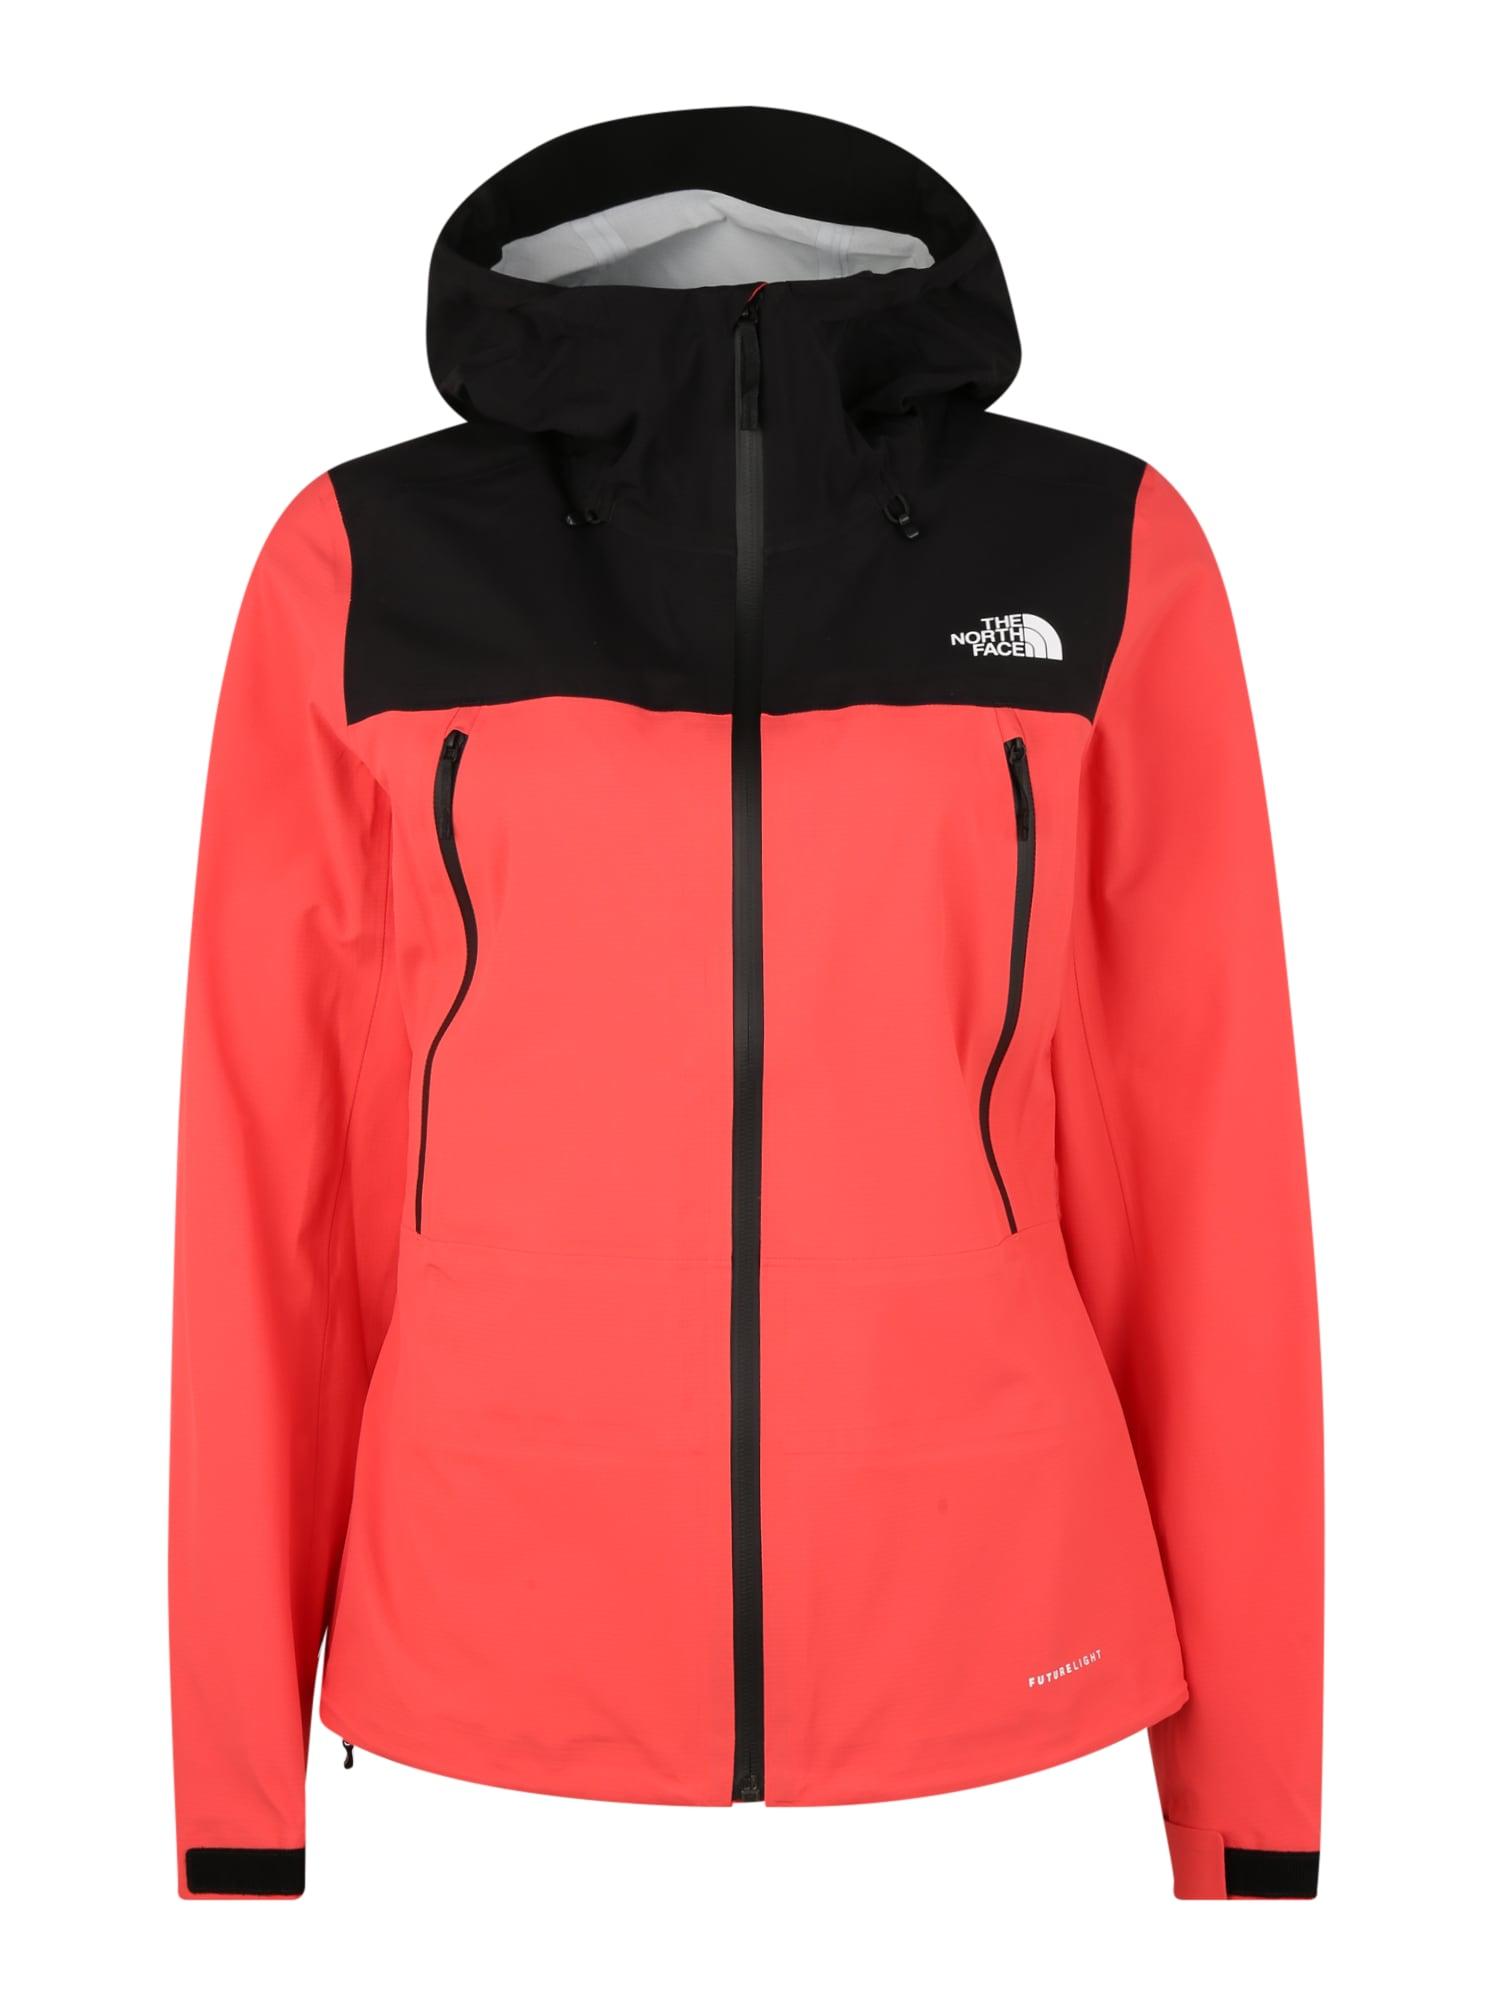 THE NORTH FACE Prechodná bunda 'W TENTE FUTURELIGHT JACKET '  červené / čierna